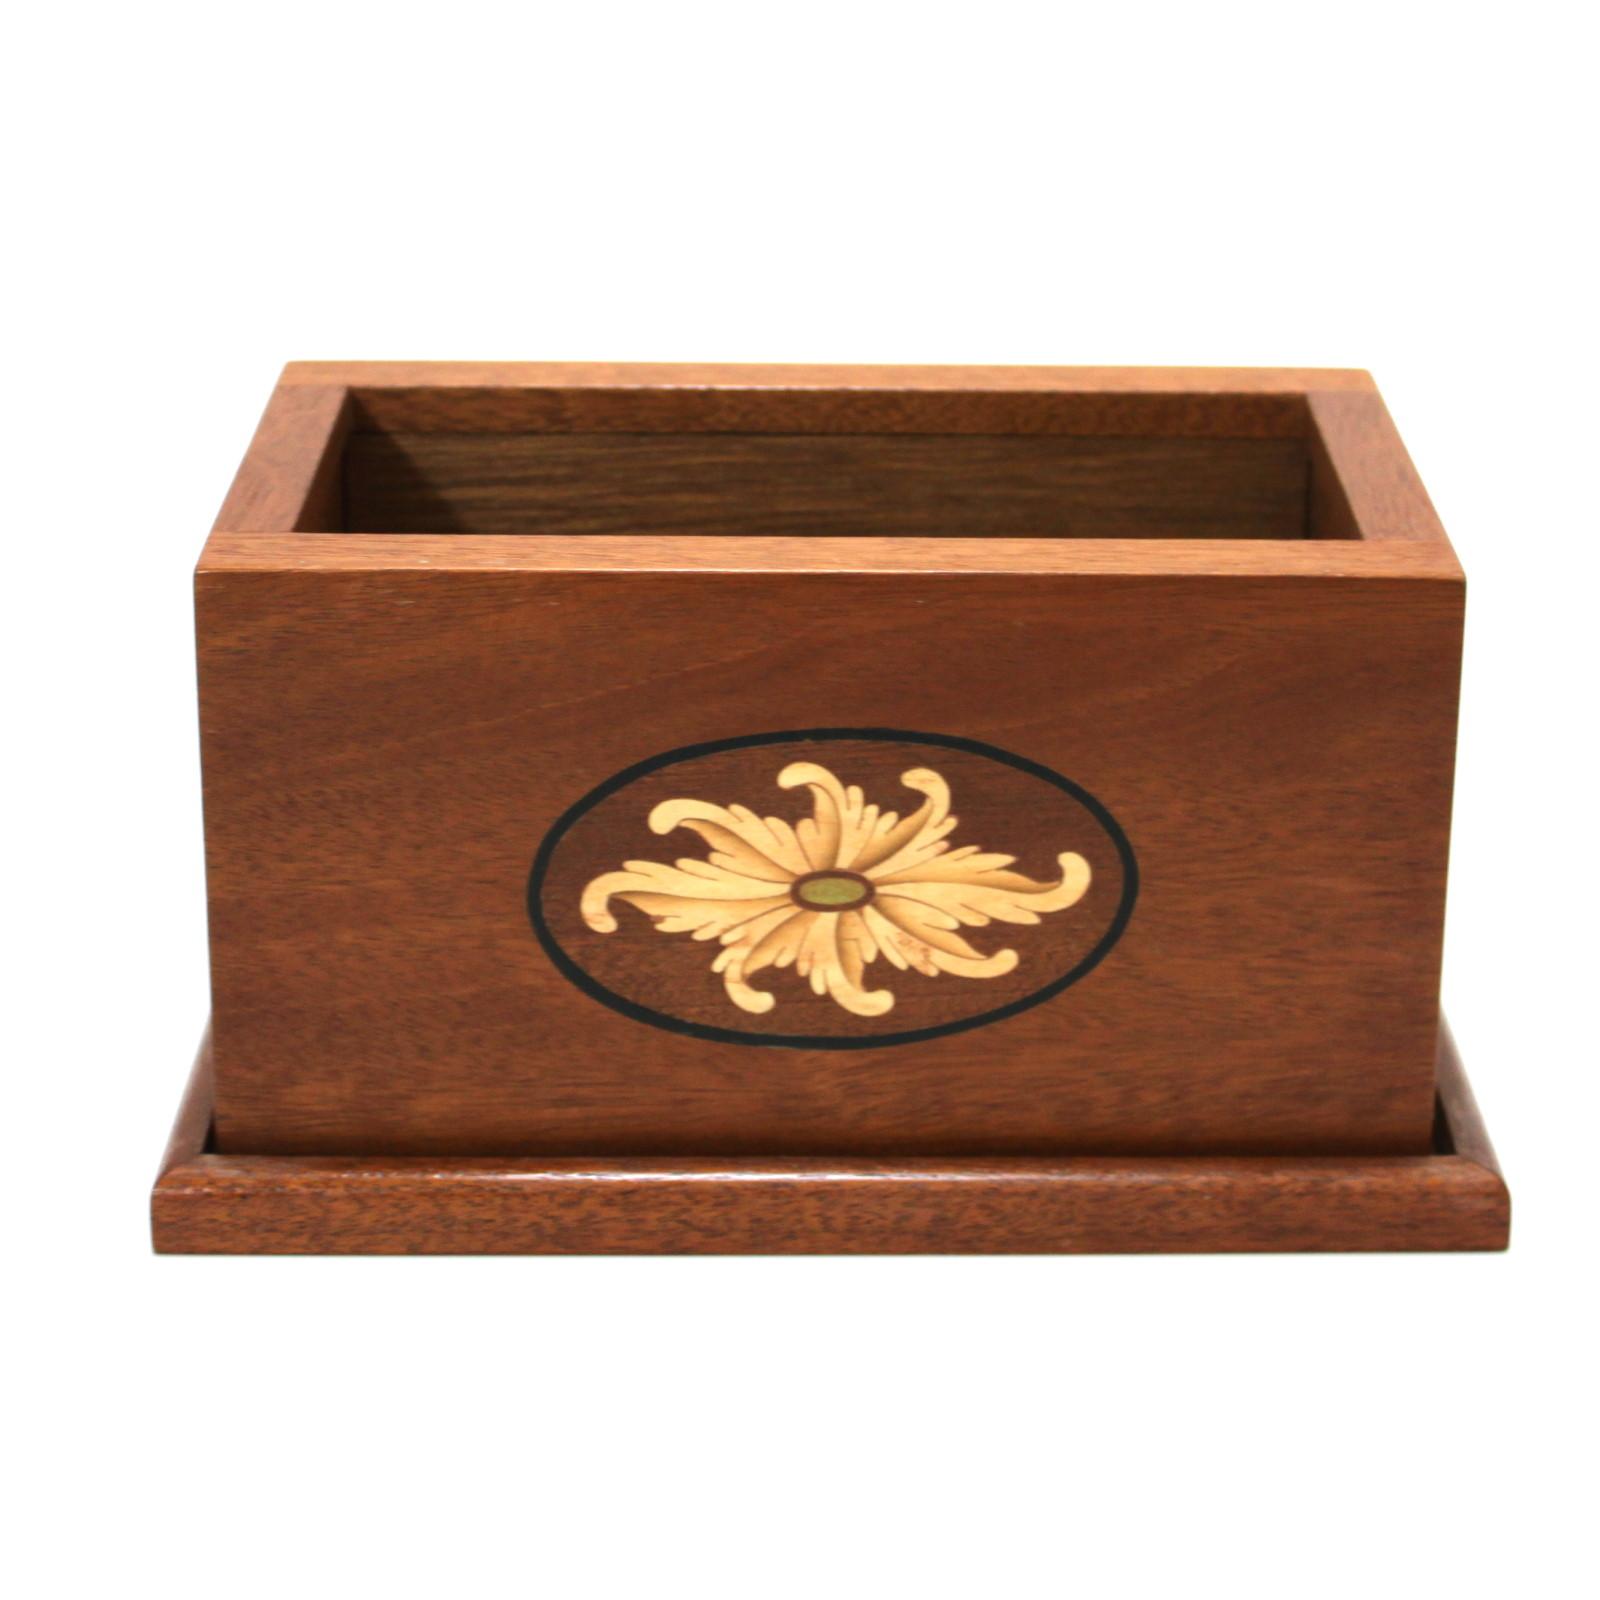 Jack Hughes Handkerchief (Jap) Box by Viking Mfg.